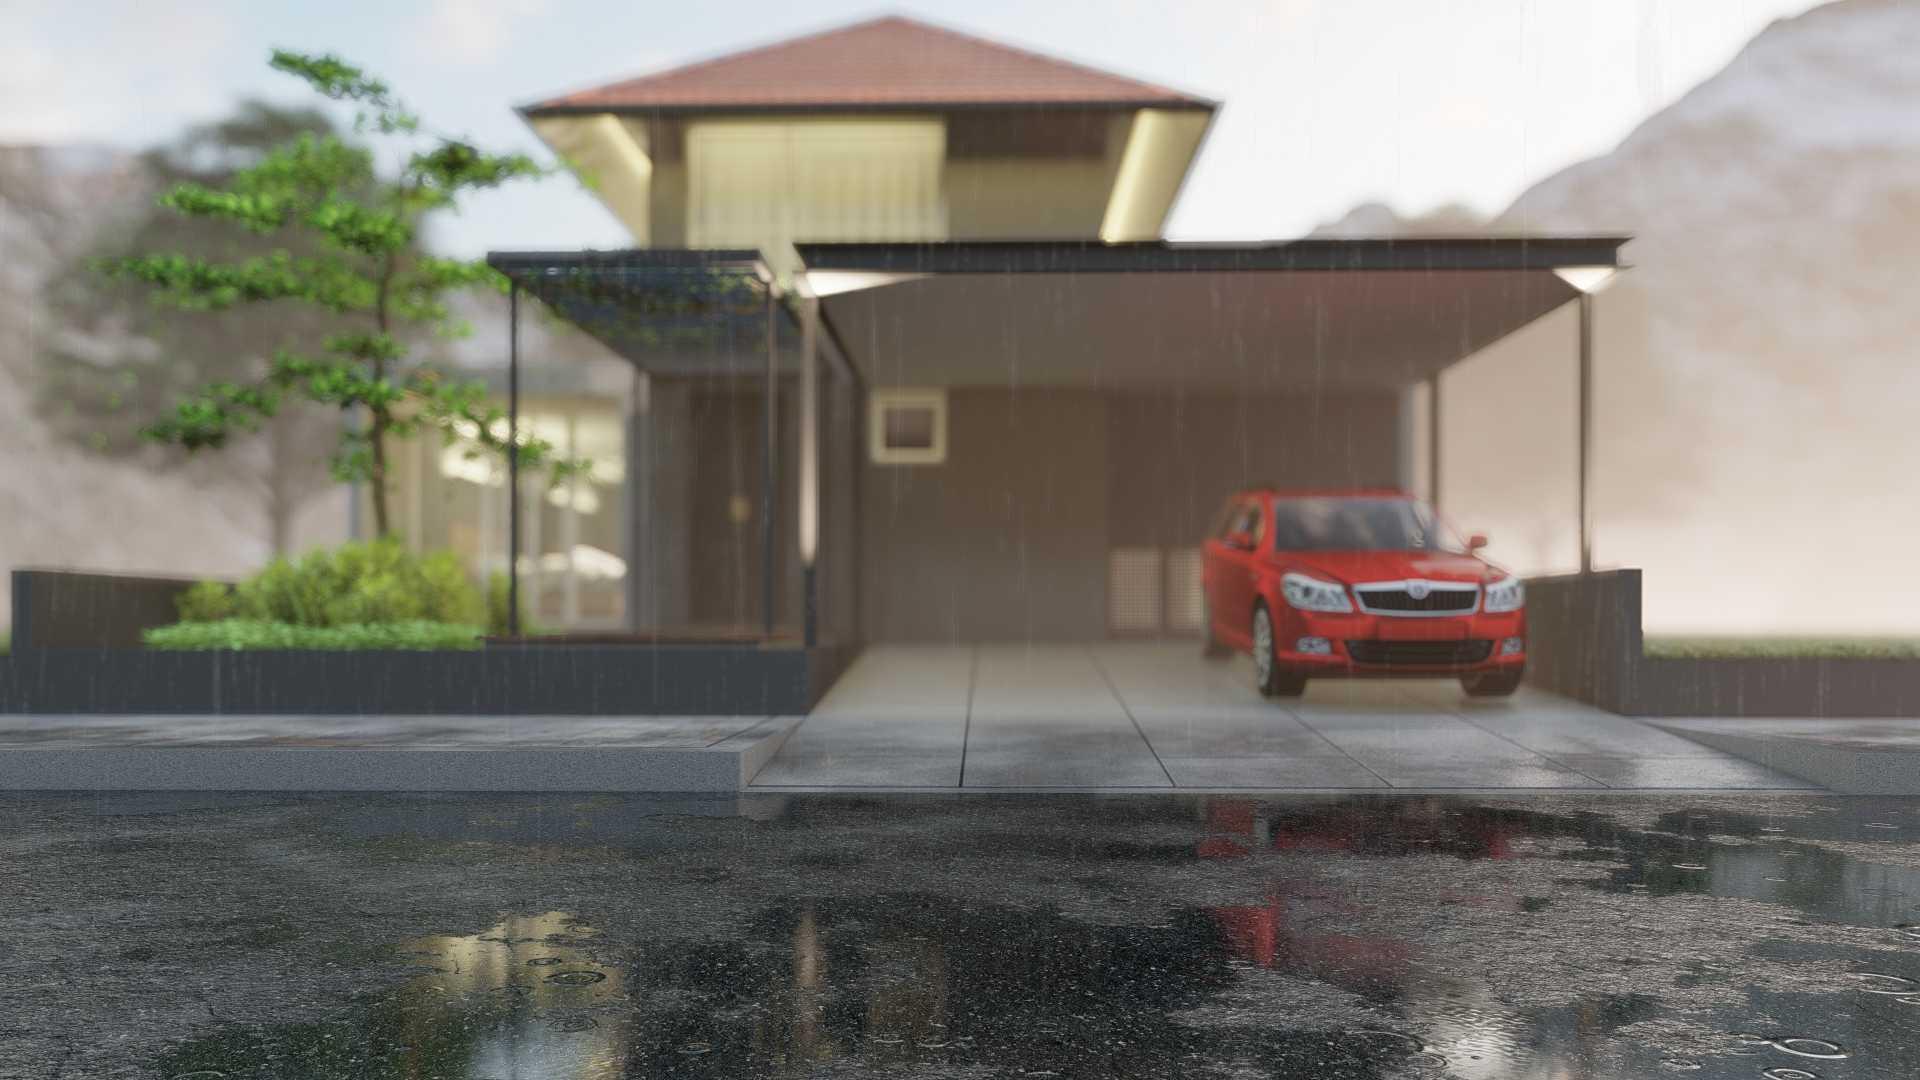 Arkitekt.id Mp House Bandung, Kota Bandung, Jawa Barat, Indonesia Bandung, Kota Bandung, Jawa Barat, Indonesia Arkitektid-Mp-House   69506